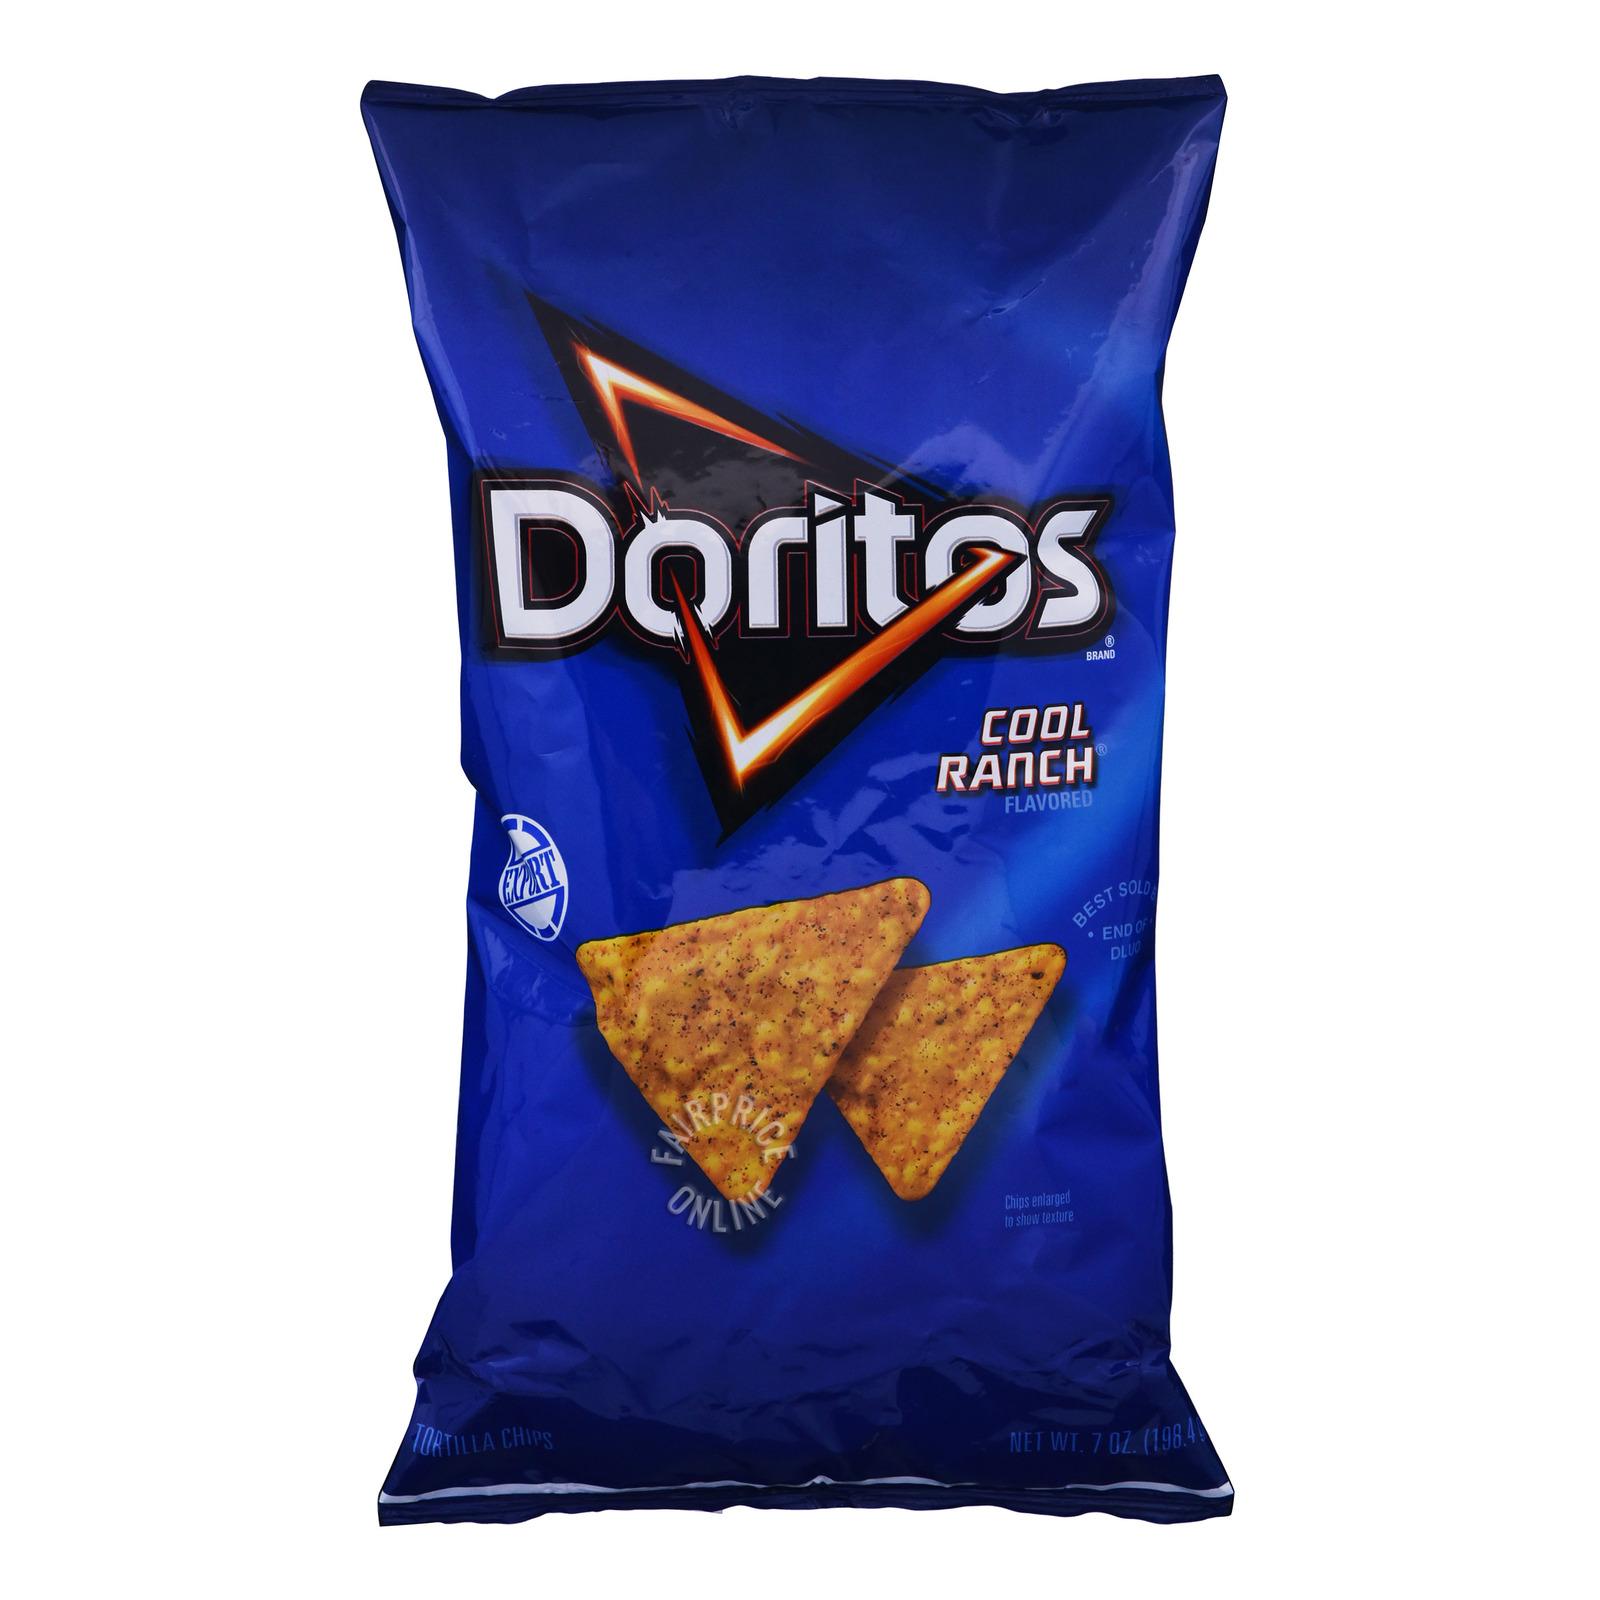 Doritos Tortilla Chips - Cool Ranch